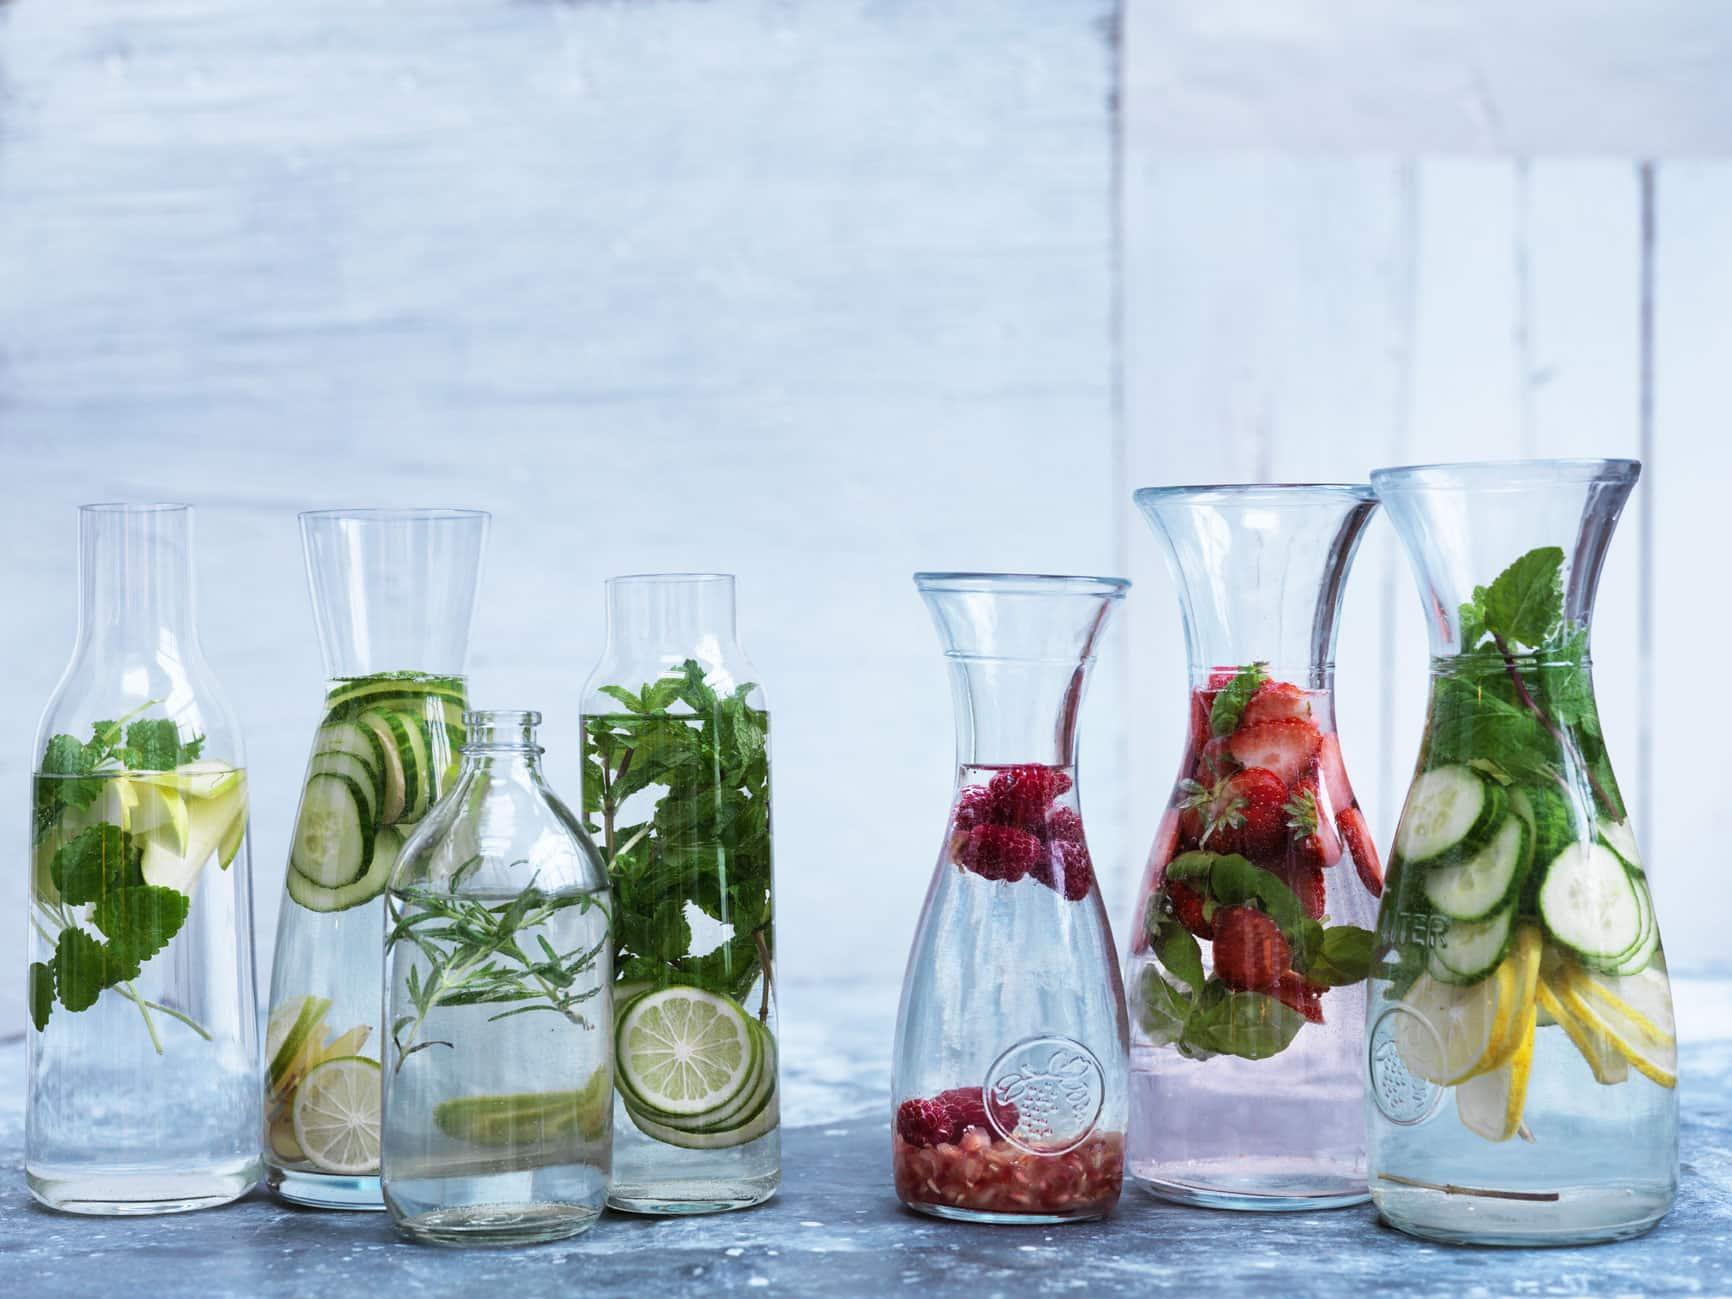 Vitaminvand - hjemmelavede infused waters. Drik mere vand med disse lækre forslag